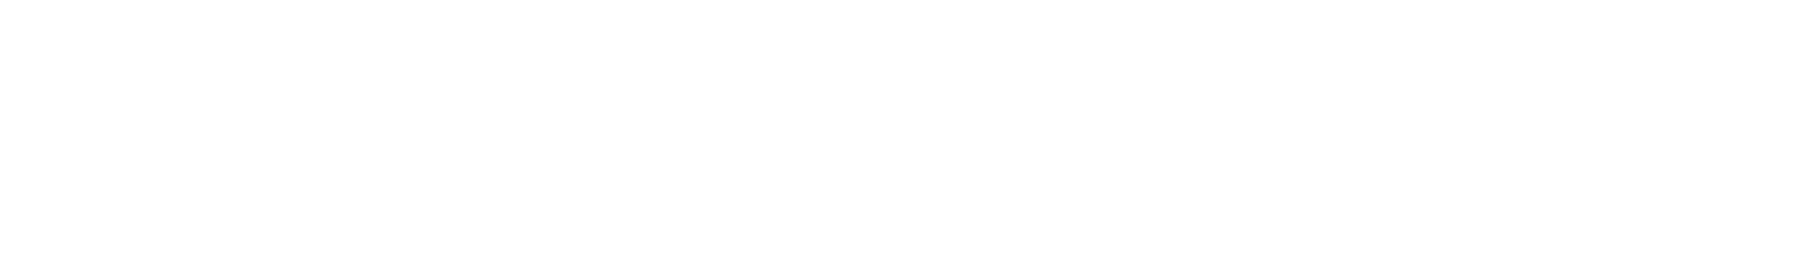 seq8 124